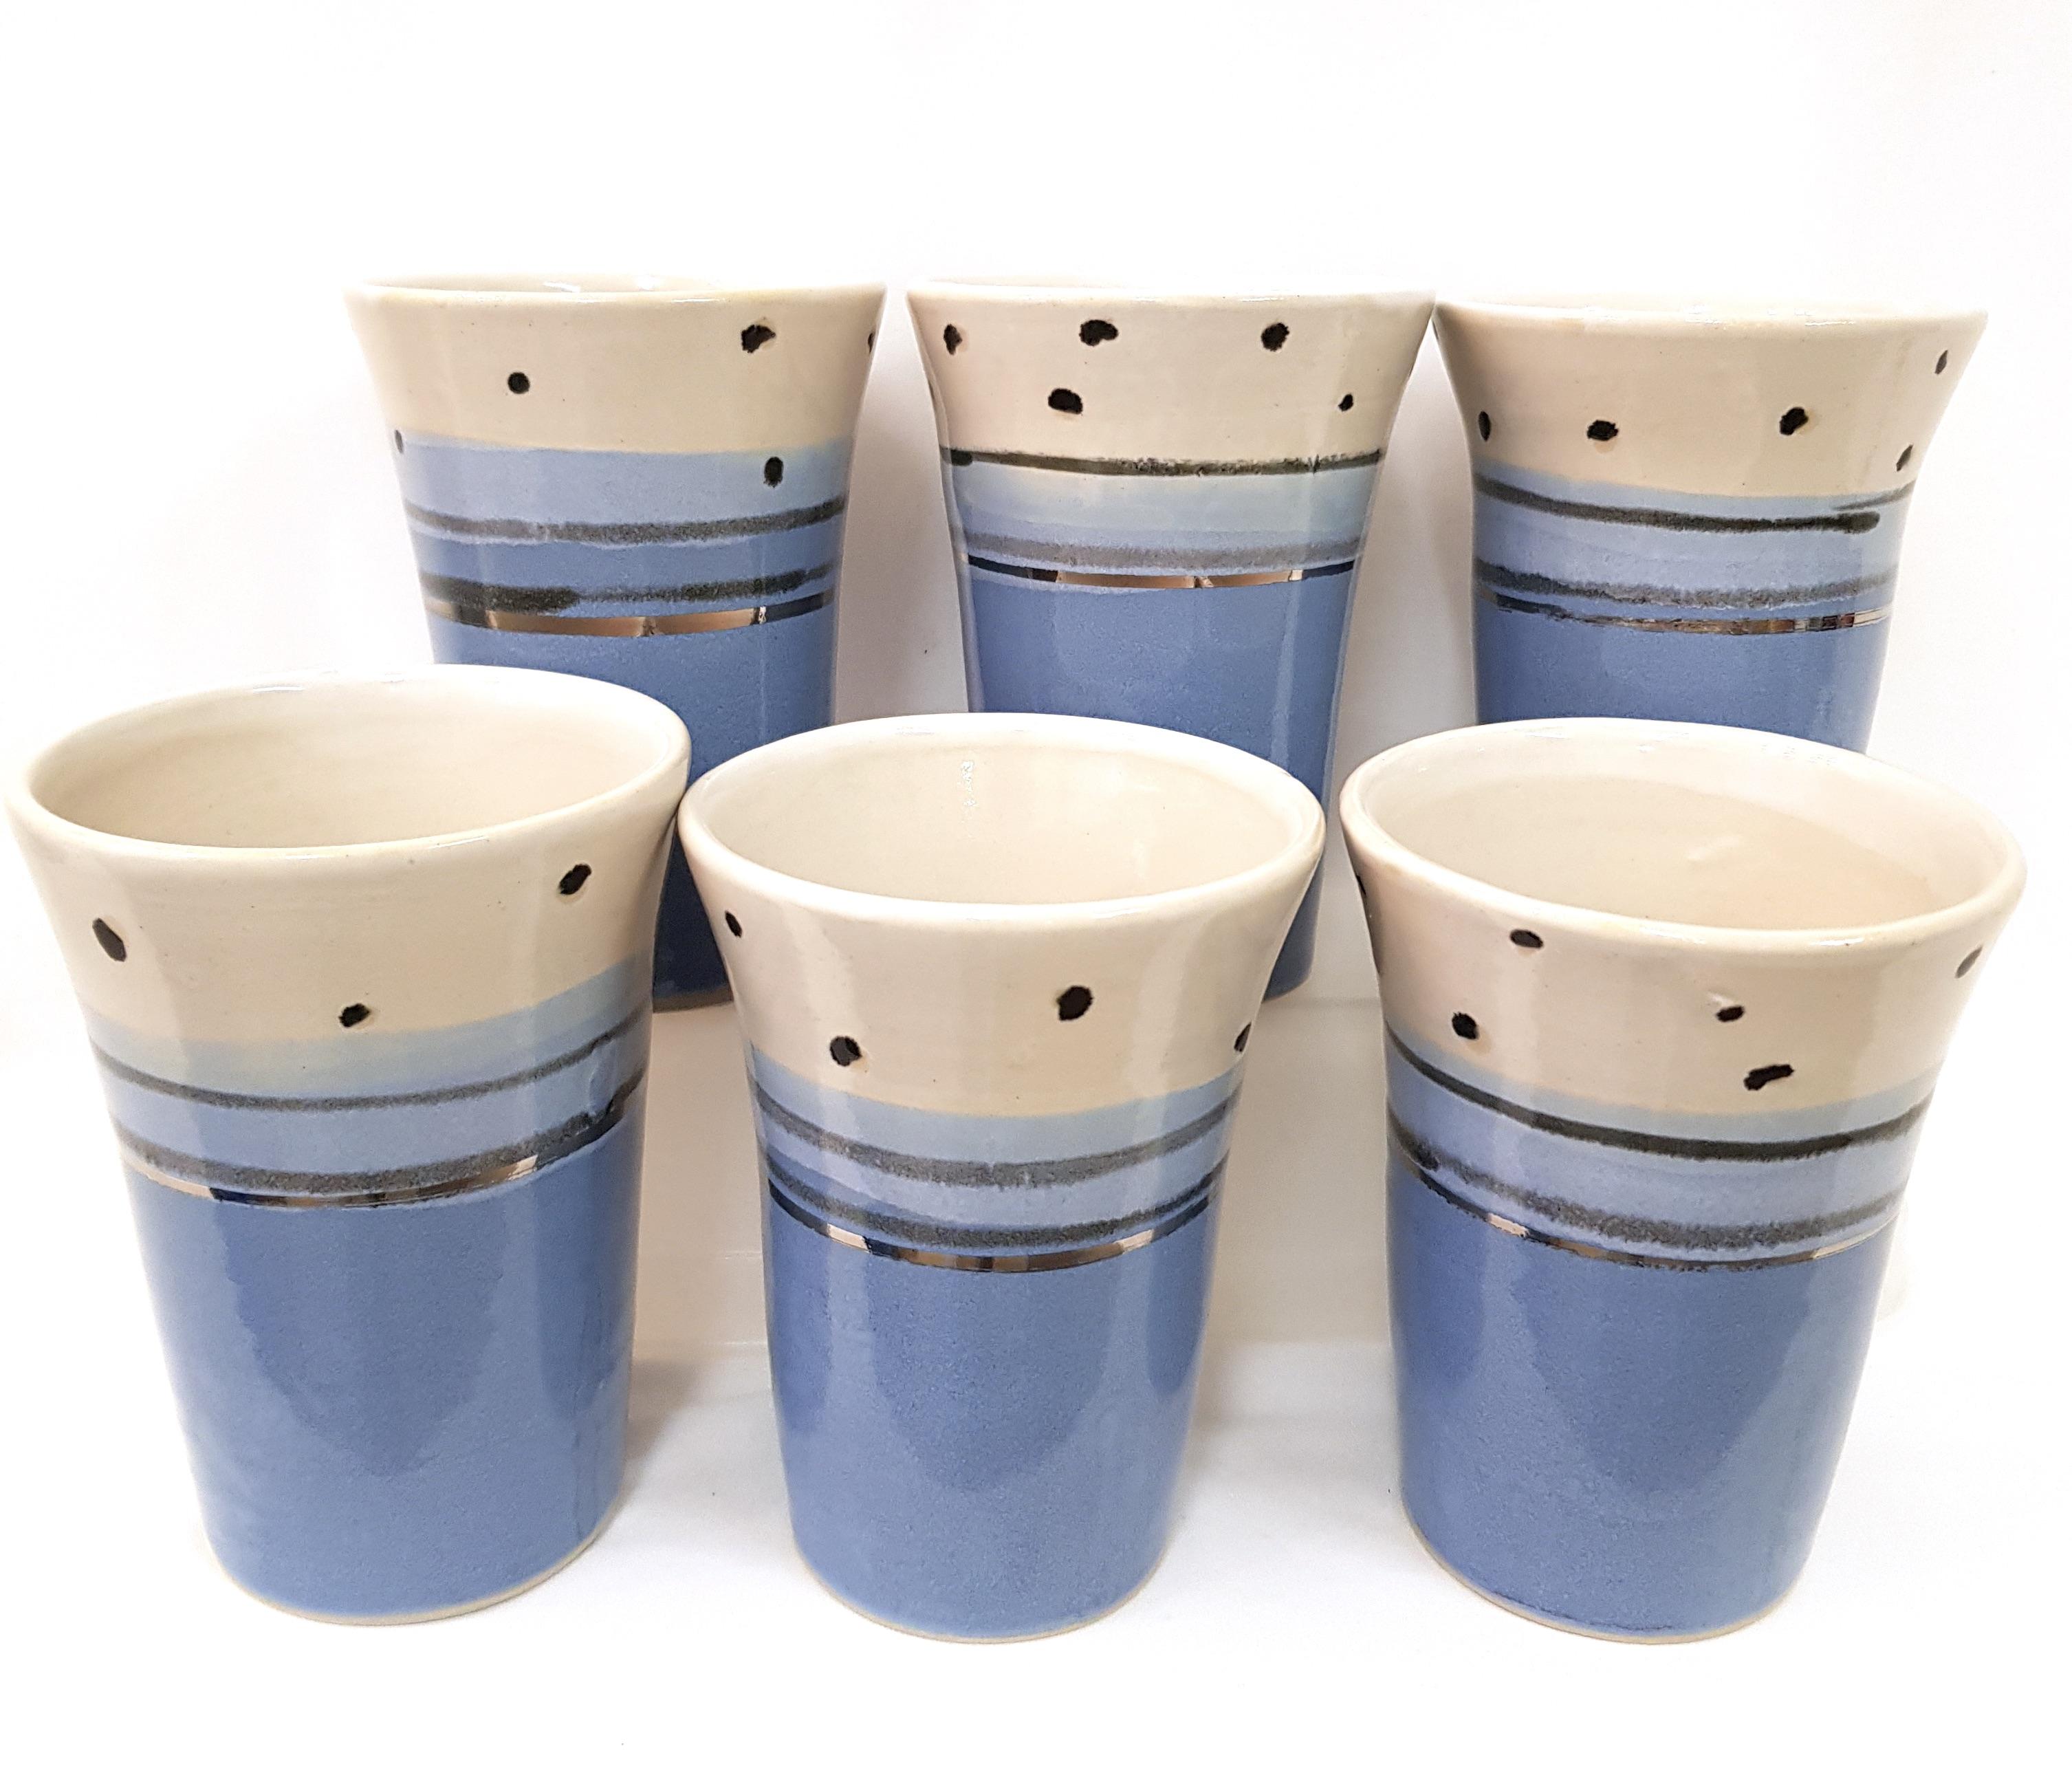 Becher Keramik, Unikat, Töpferei la Ceramica Basel, Töpferkurse, Shop, Keramik